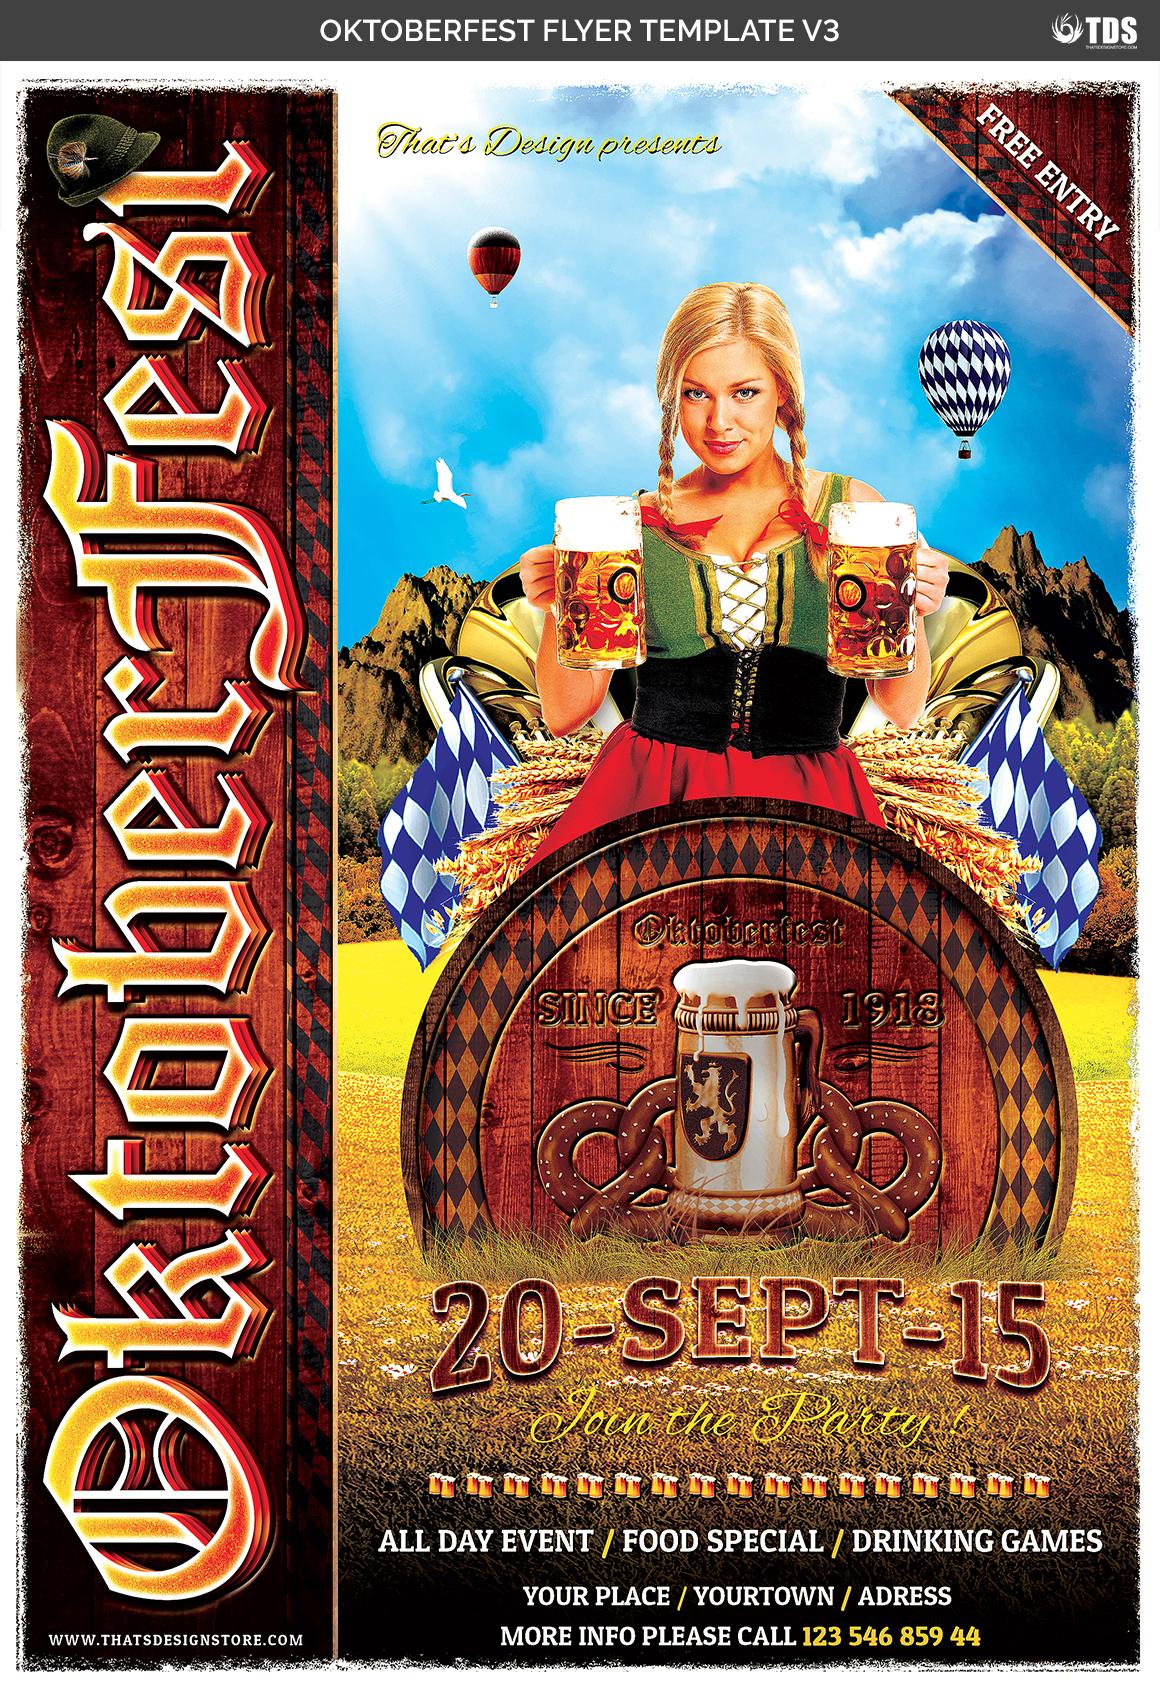 Oktoberfest Flyer Template V3 example image 7